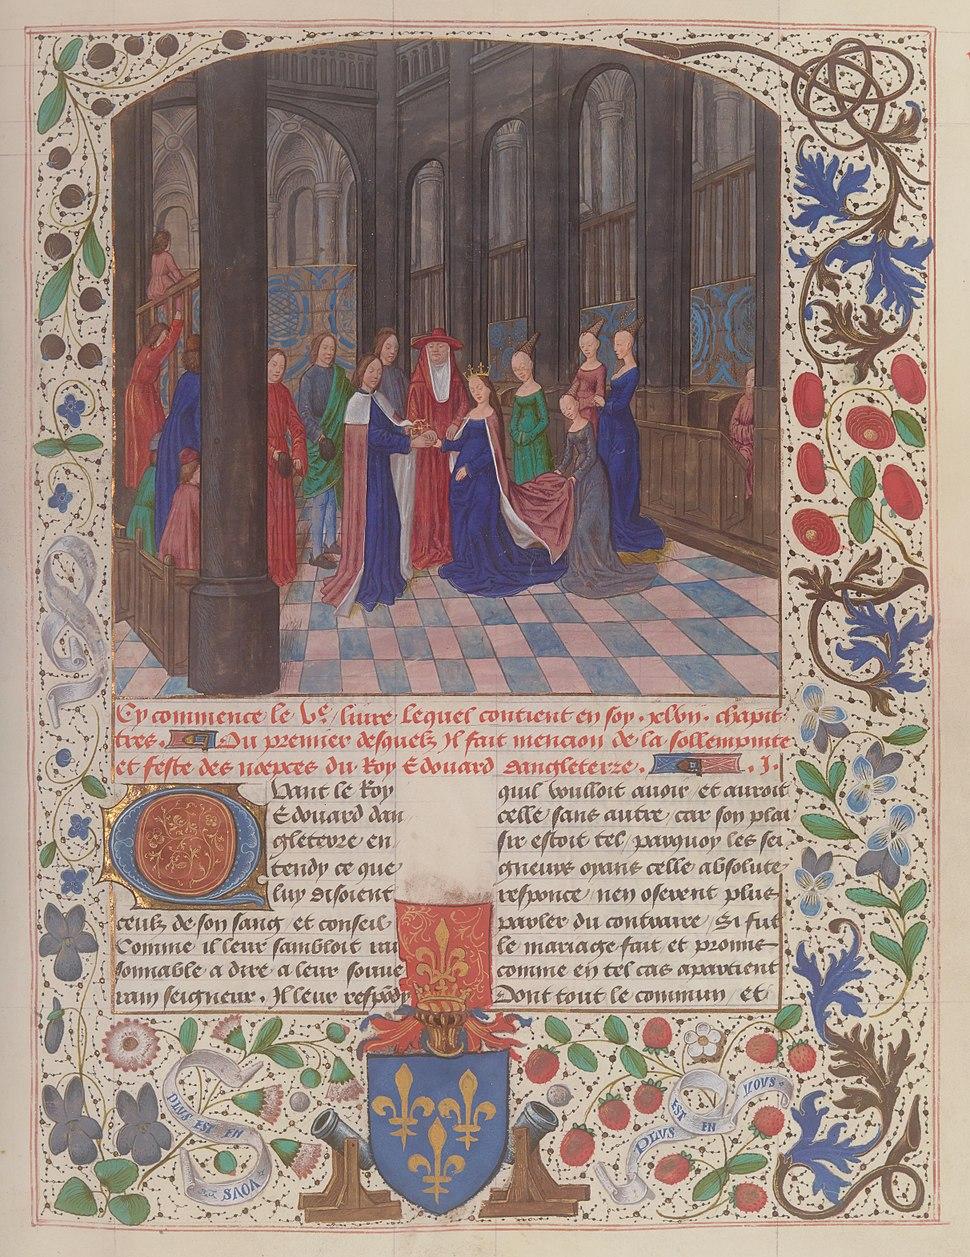 Marriage Edward IV Elizabeth Woodville Wavrin Anciennes Chroniques d'Angleterre Francais 85 f109.jpeg